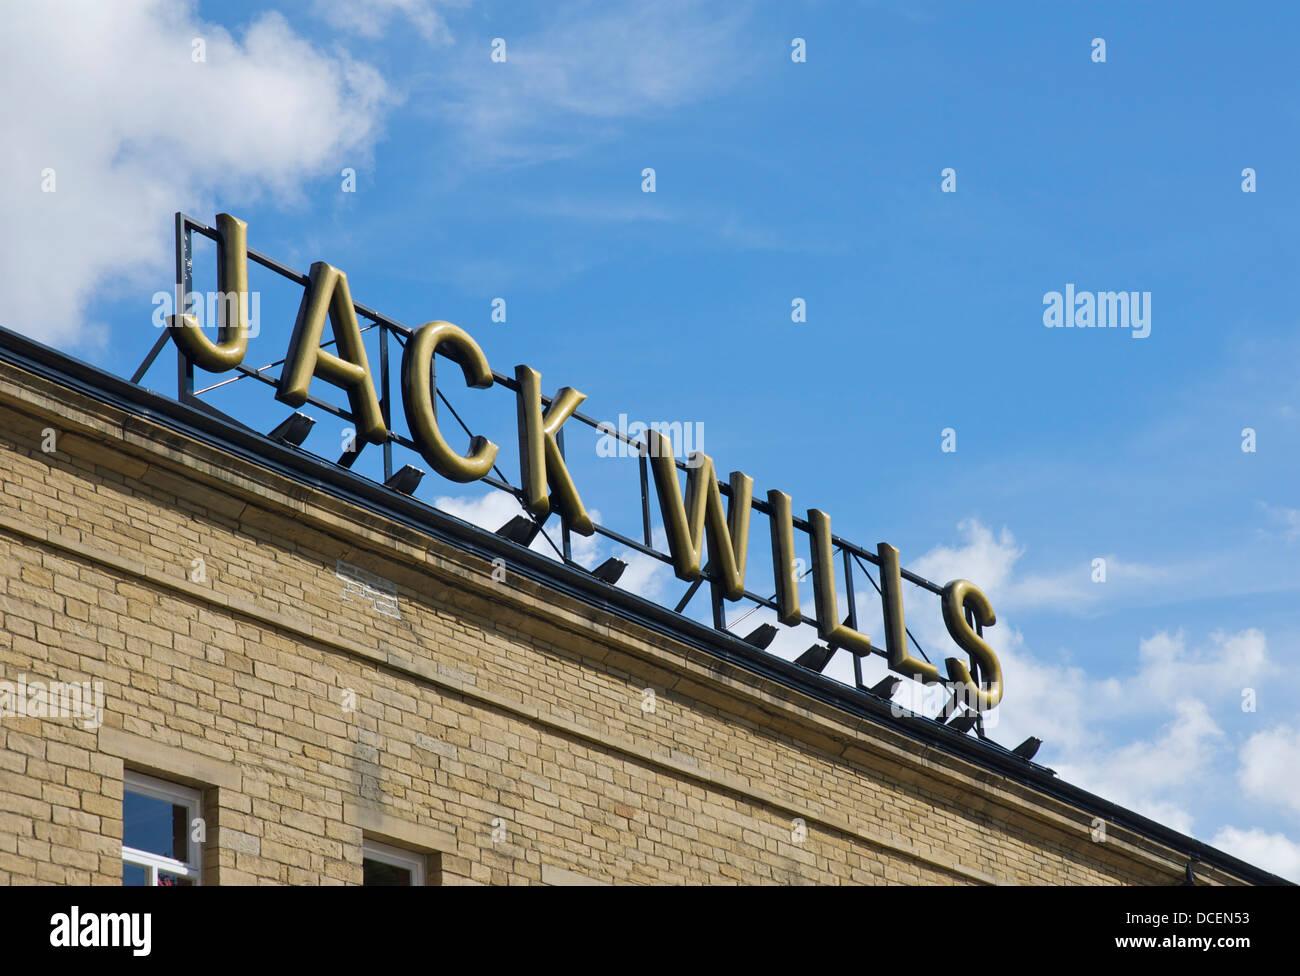 Sign for Jack Wills shop, Dean Clough Mills, Halifax, West Yorkshire, England UK - Stock Image